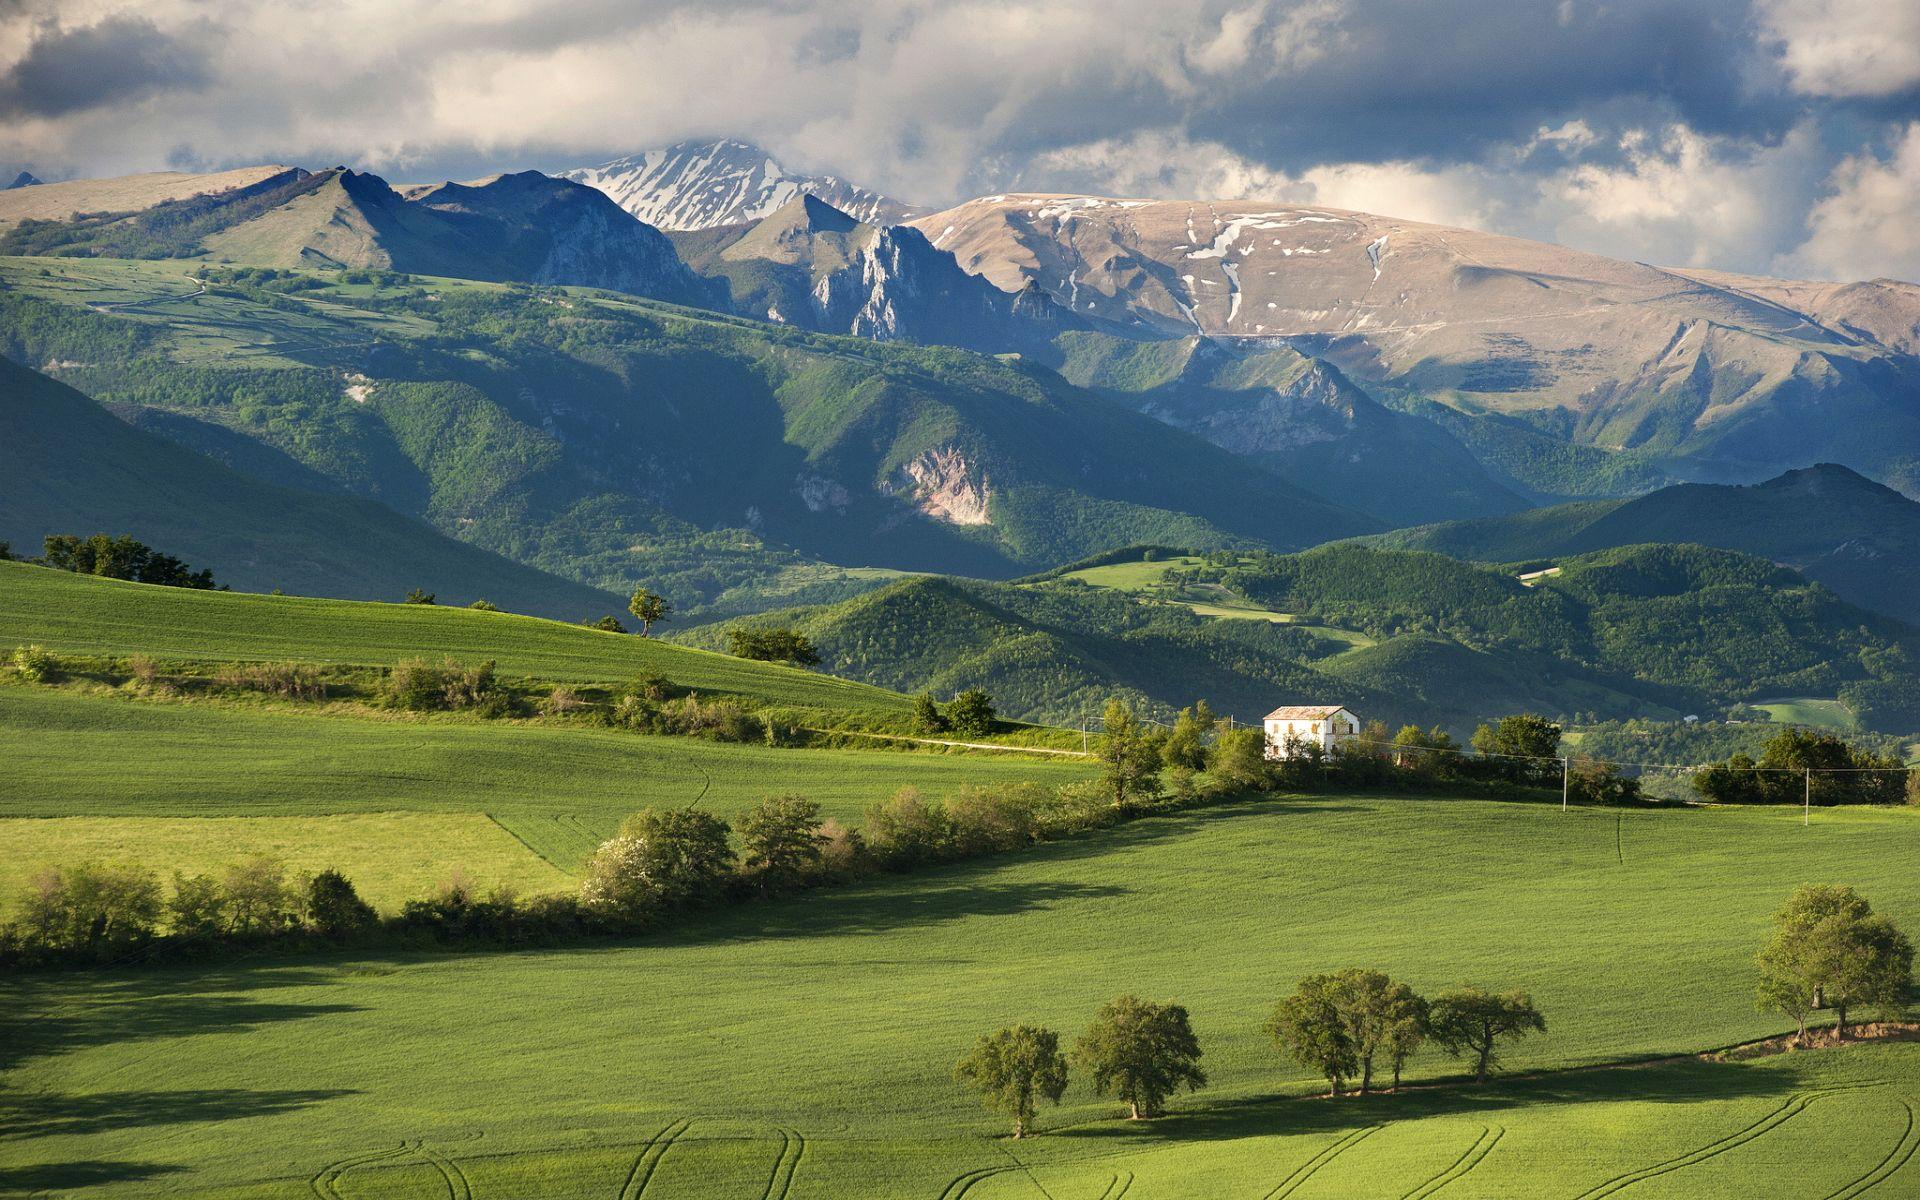 italian landscape with ox - photo #30